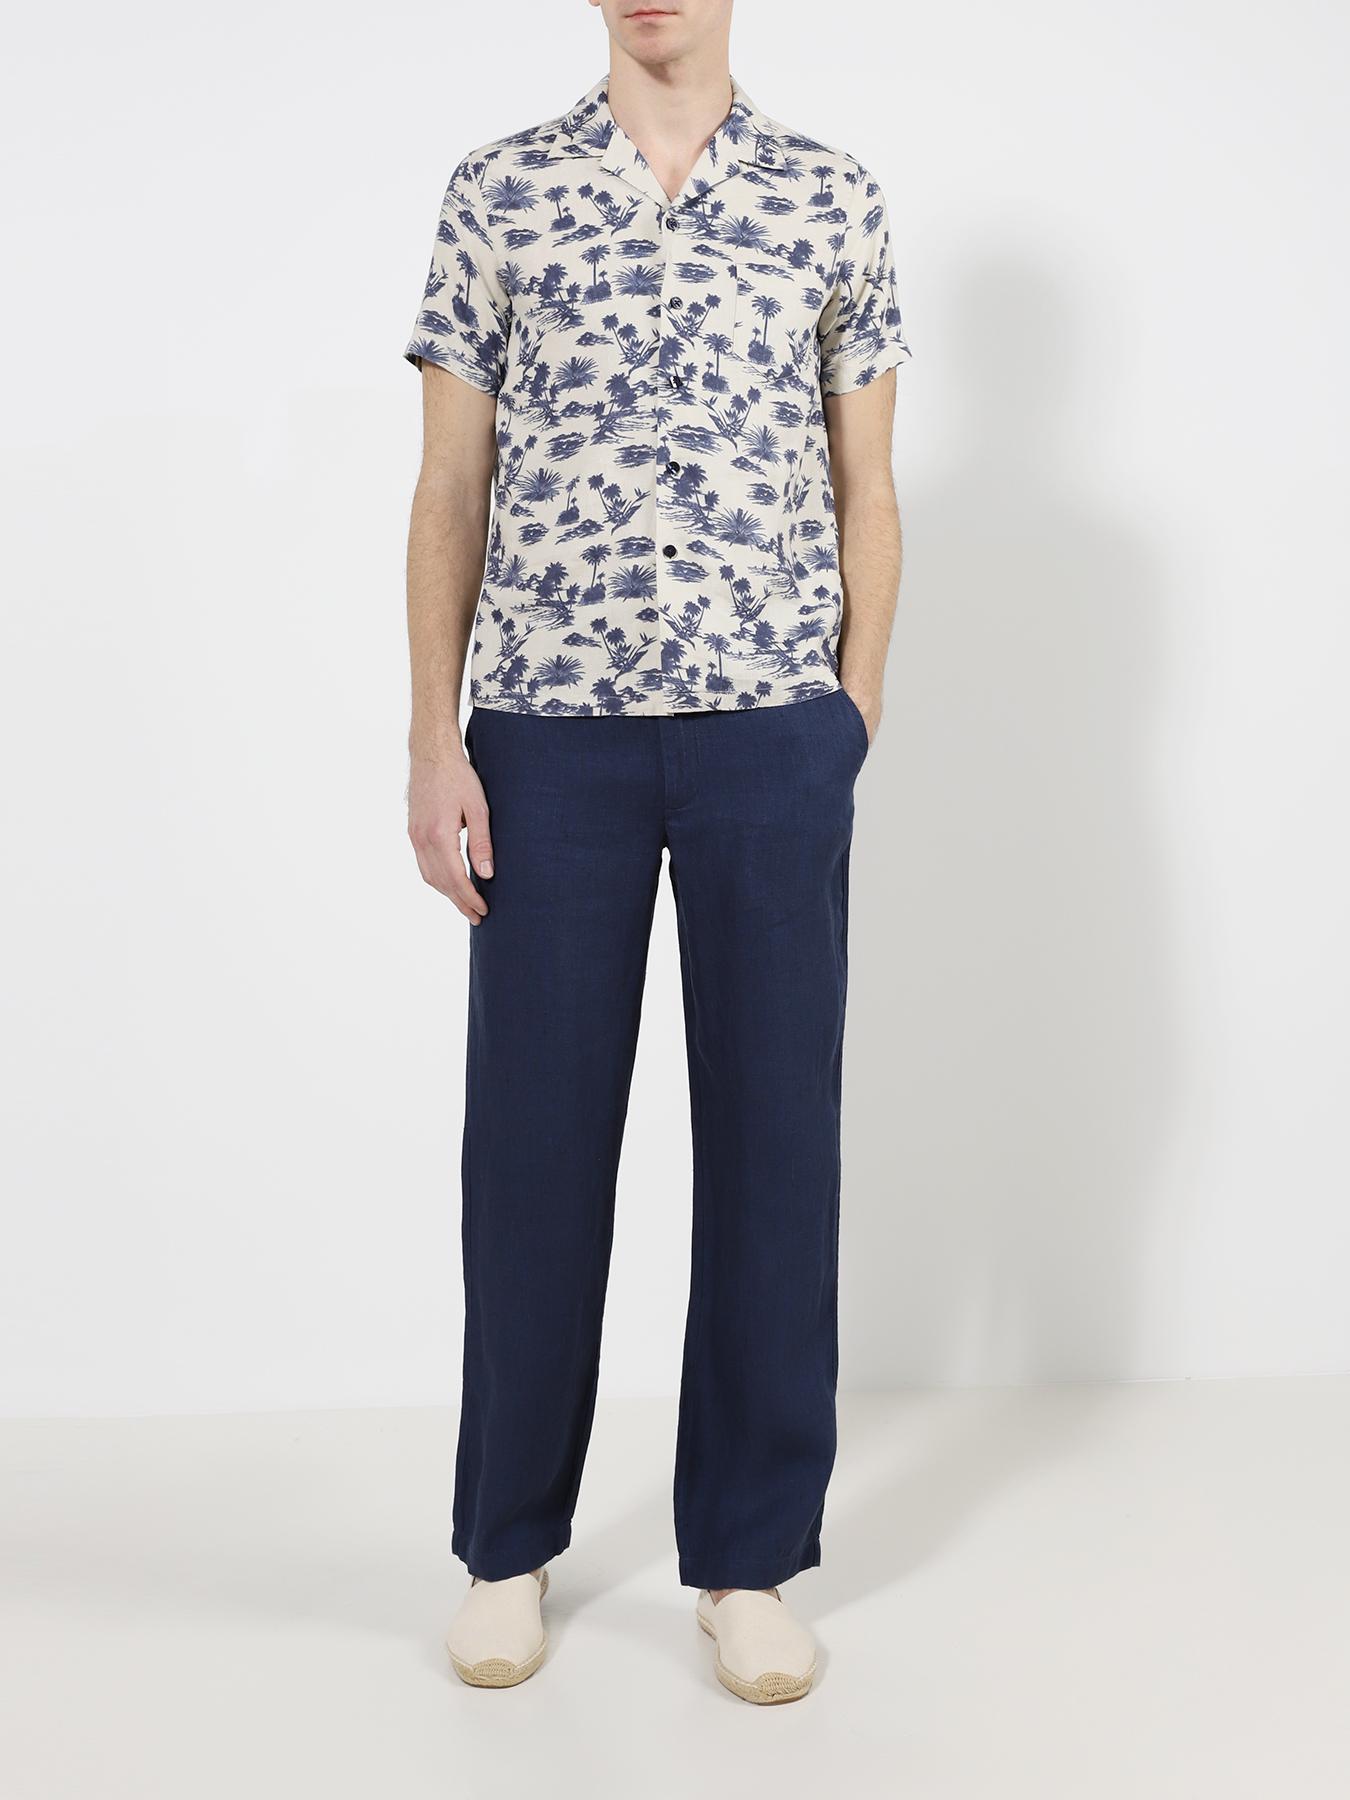 Брюки Alessandro Manzoni Jeans Льняные прямые брюки